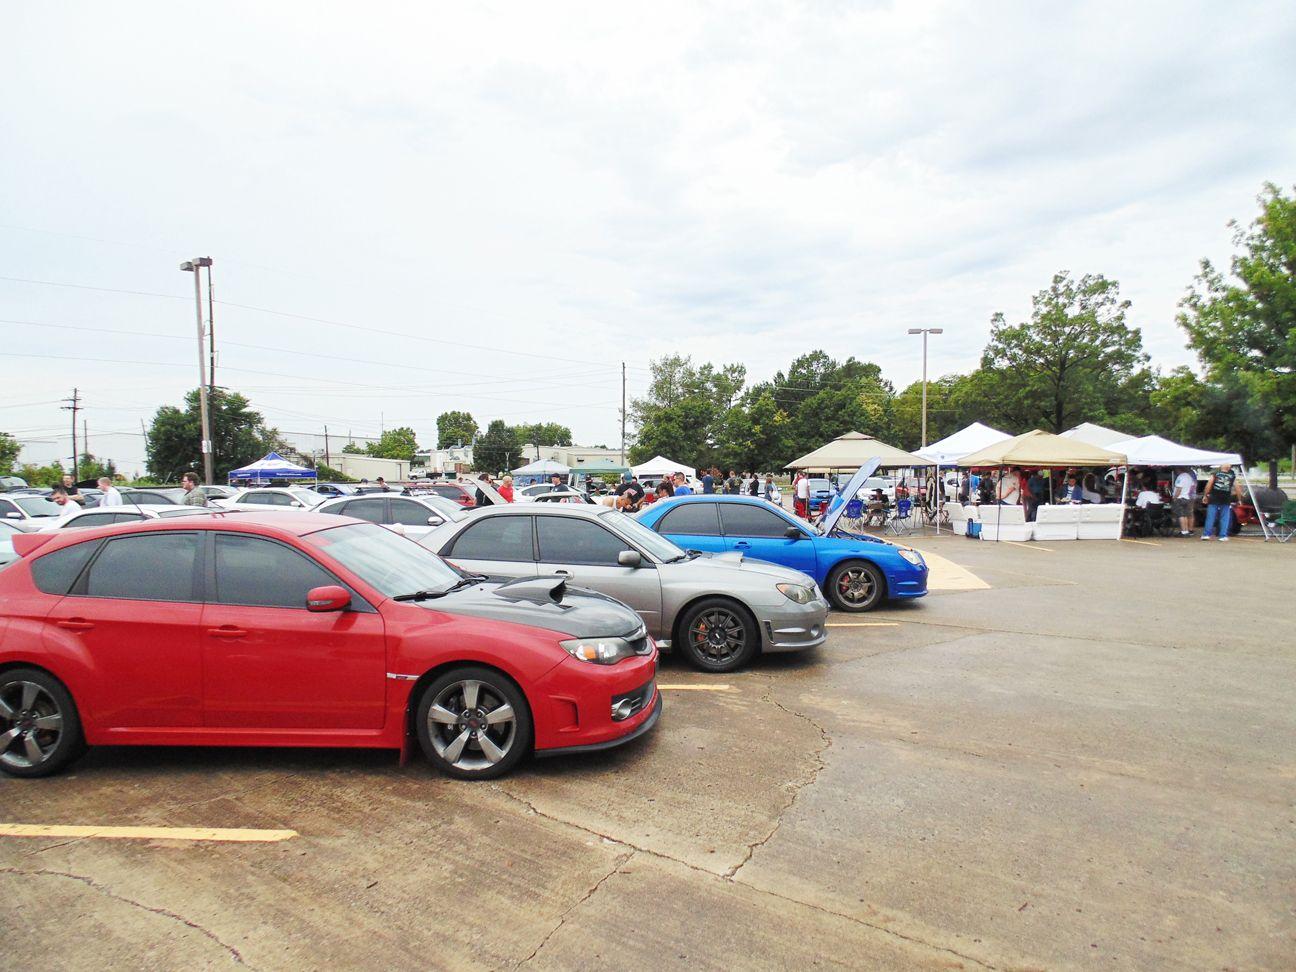 New Subaru in Broken Arrow OK. Serving Tulsa, Bixby